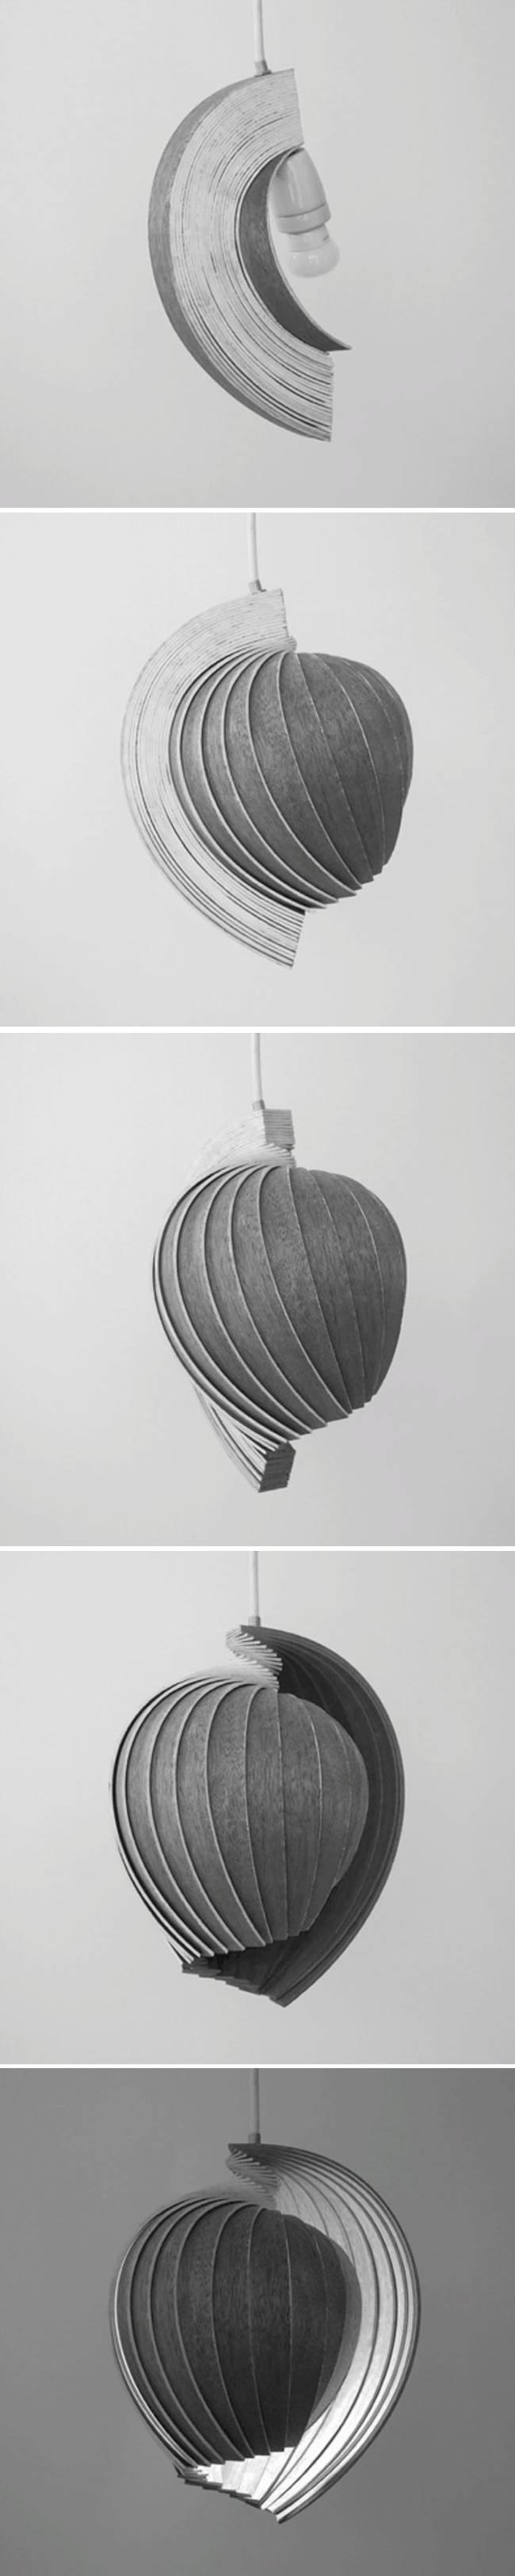 Дизайн лампы из дерева от Kovac Family - Фото 1